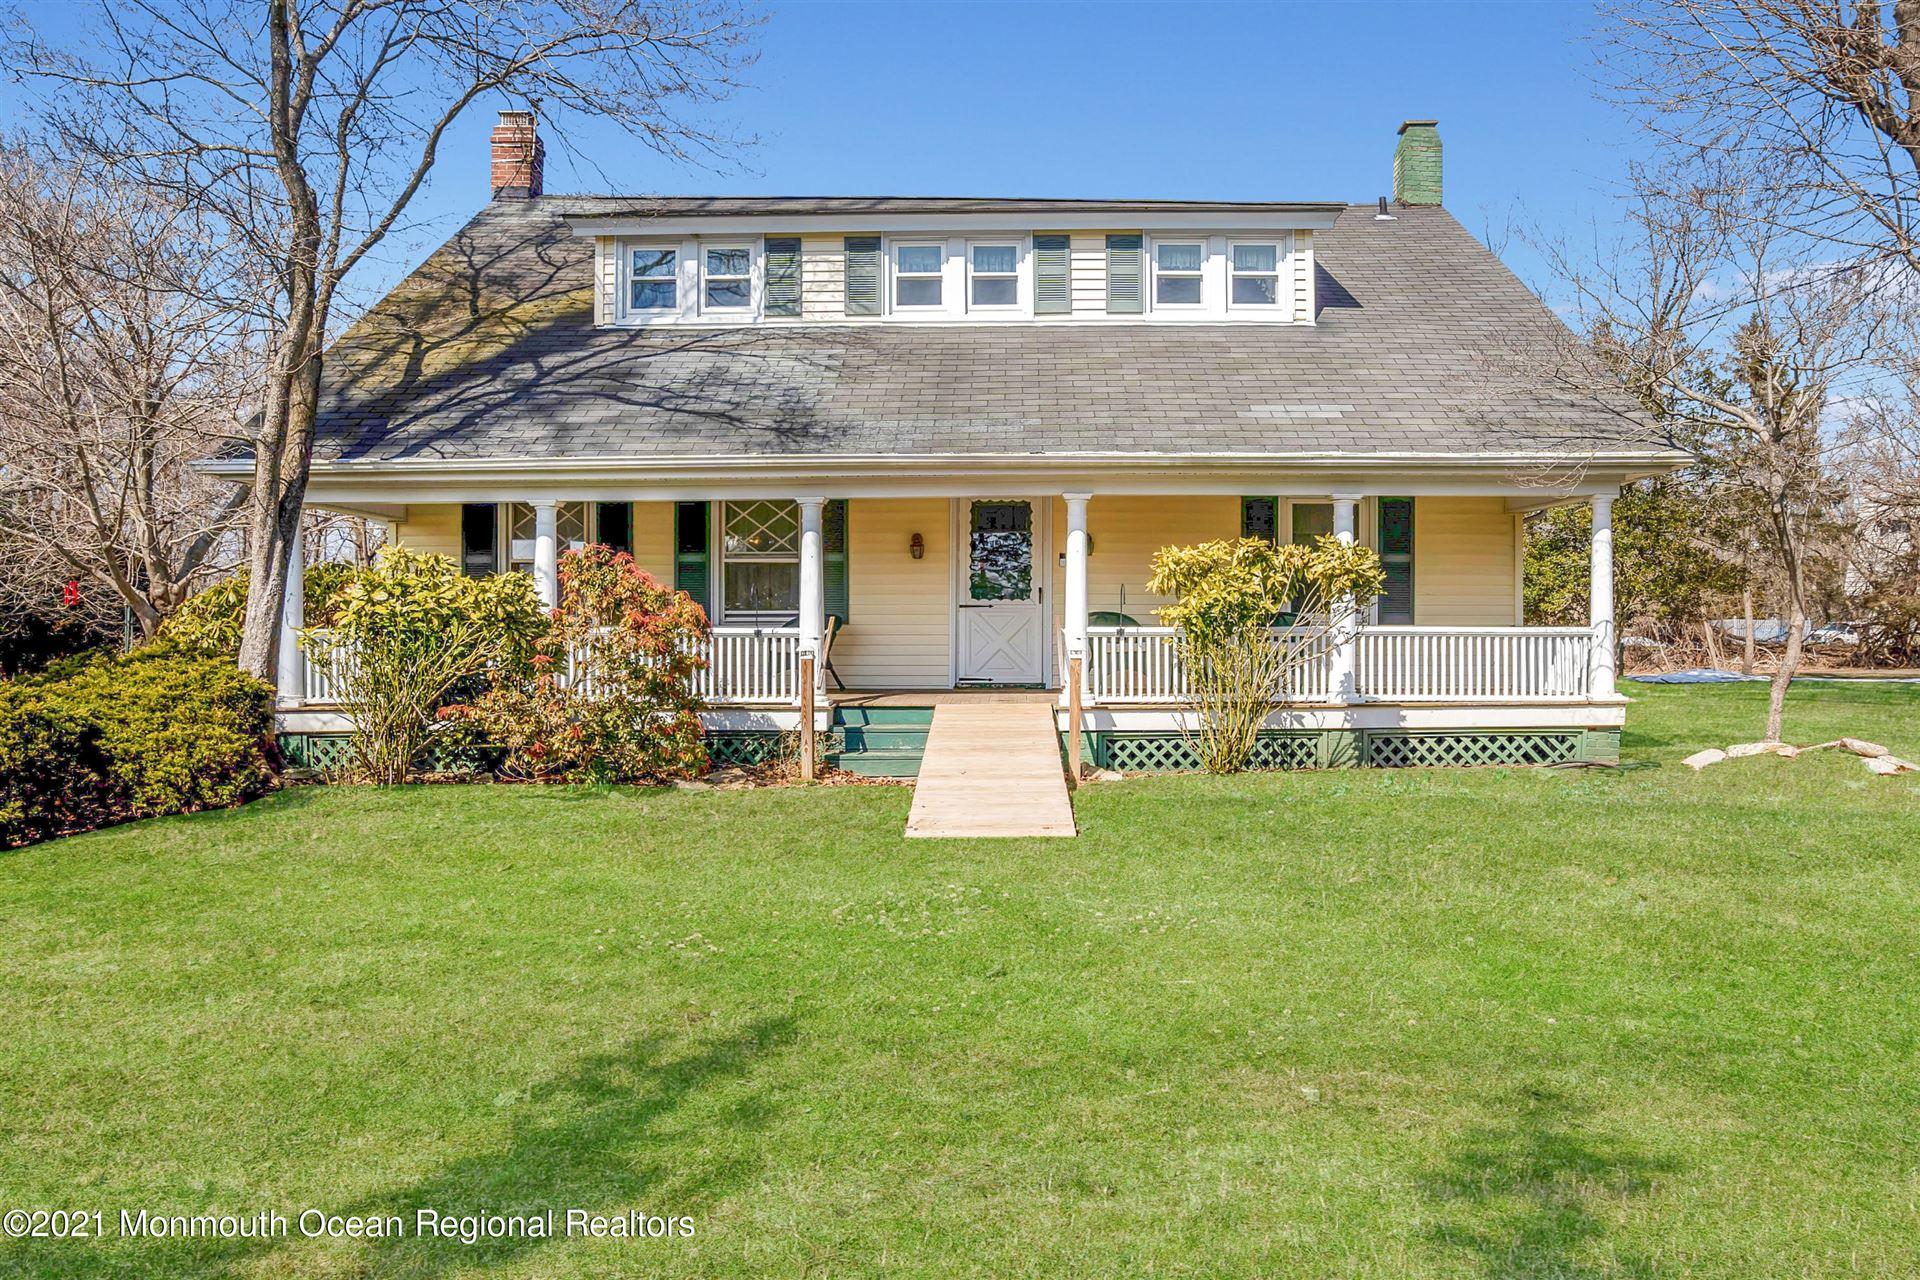 24 Schanck Road, Holmdel, NJ 07733 - MLS#: 22107979